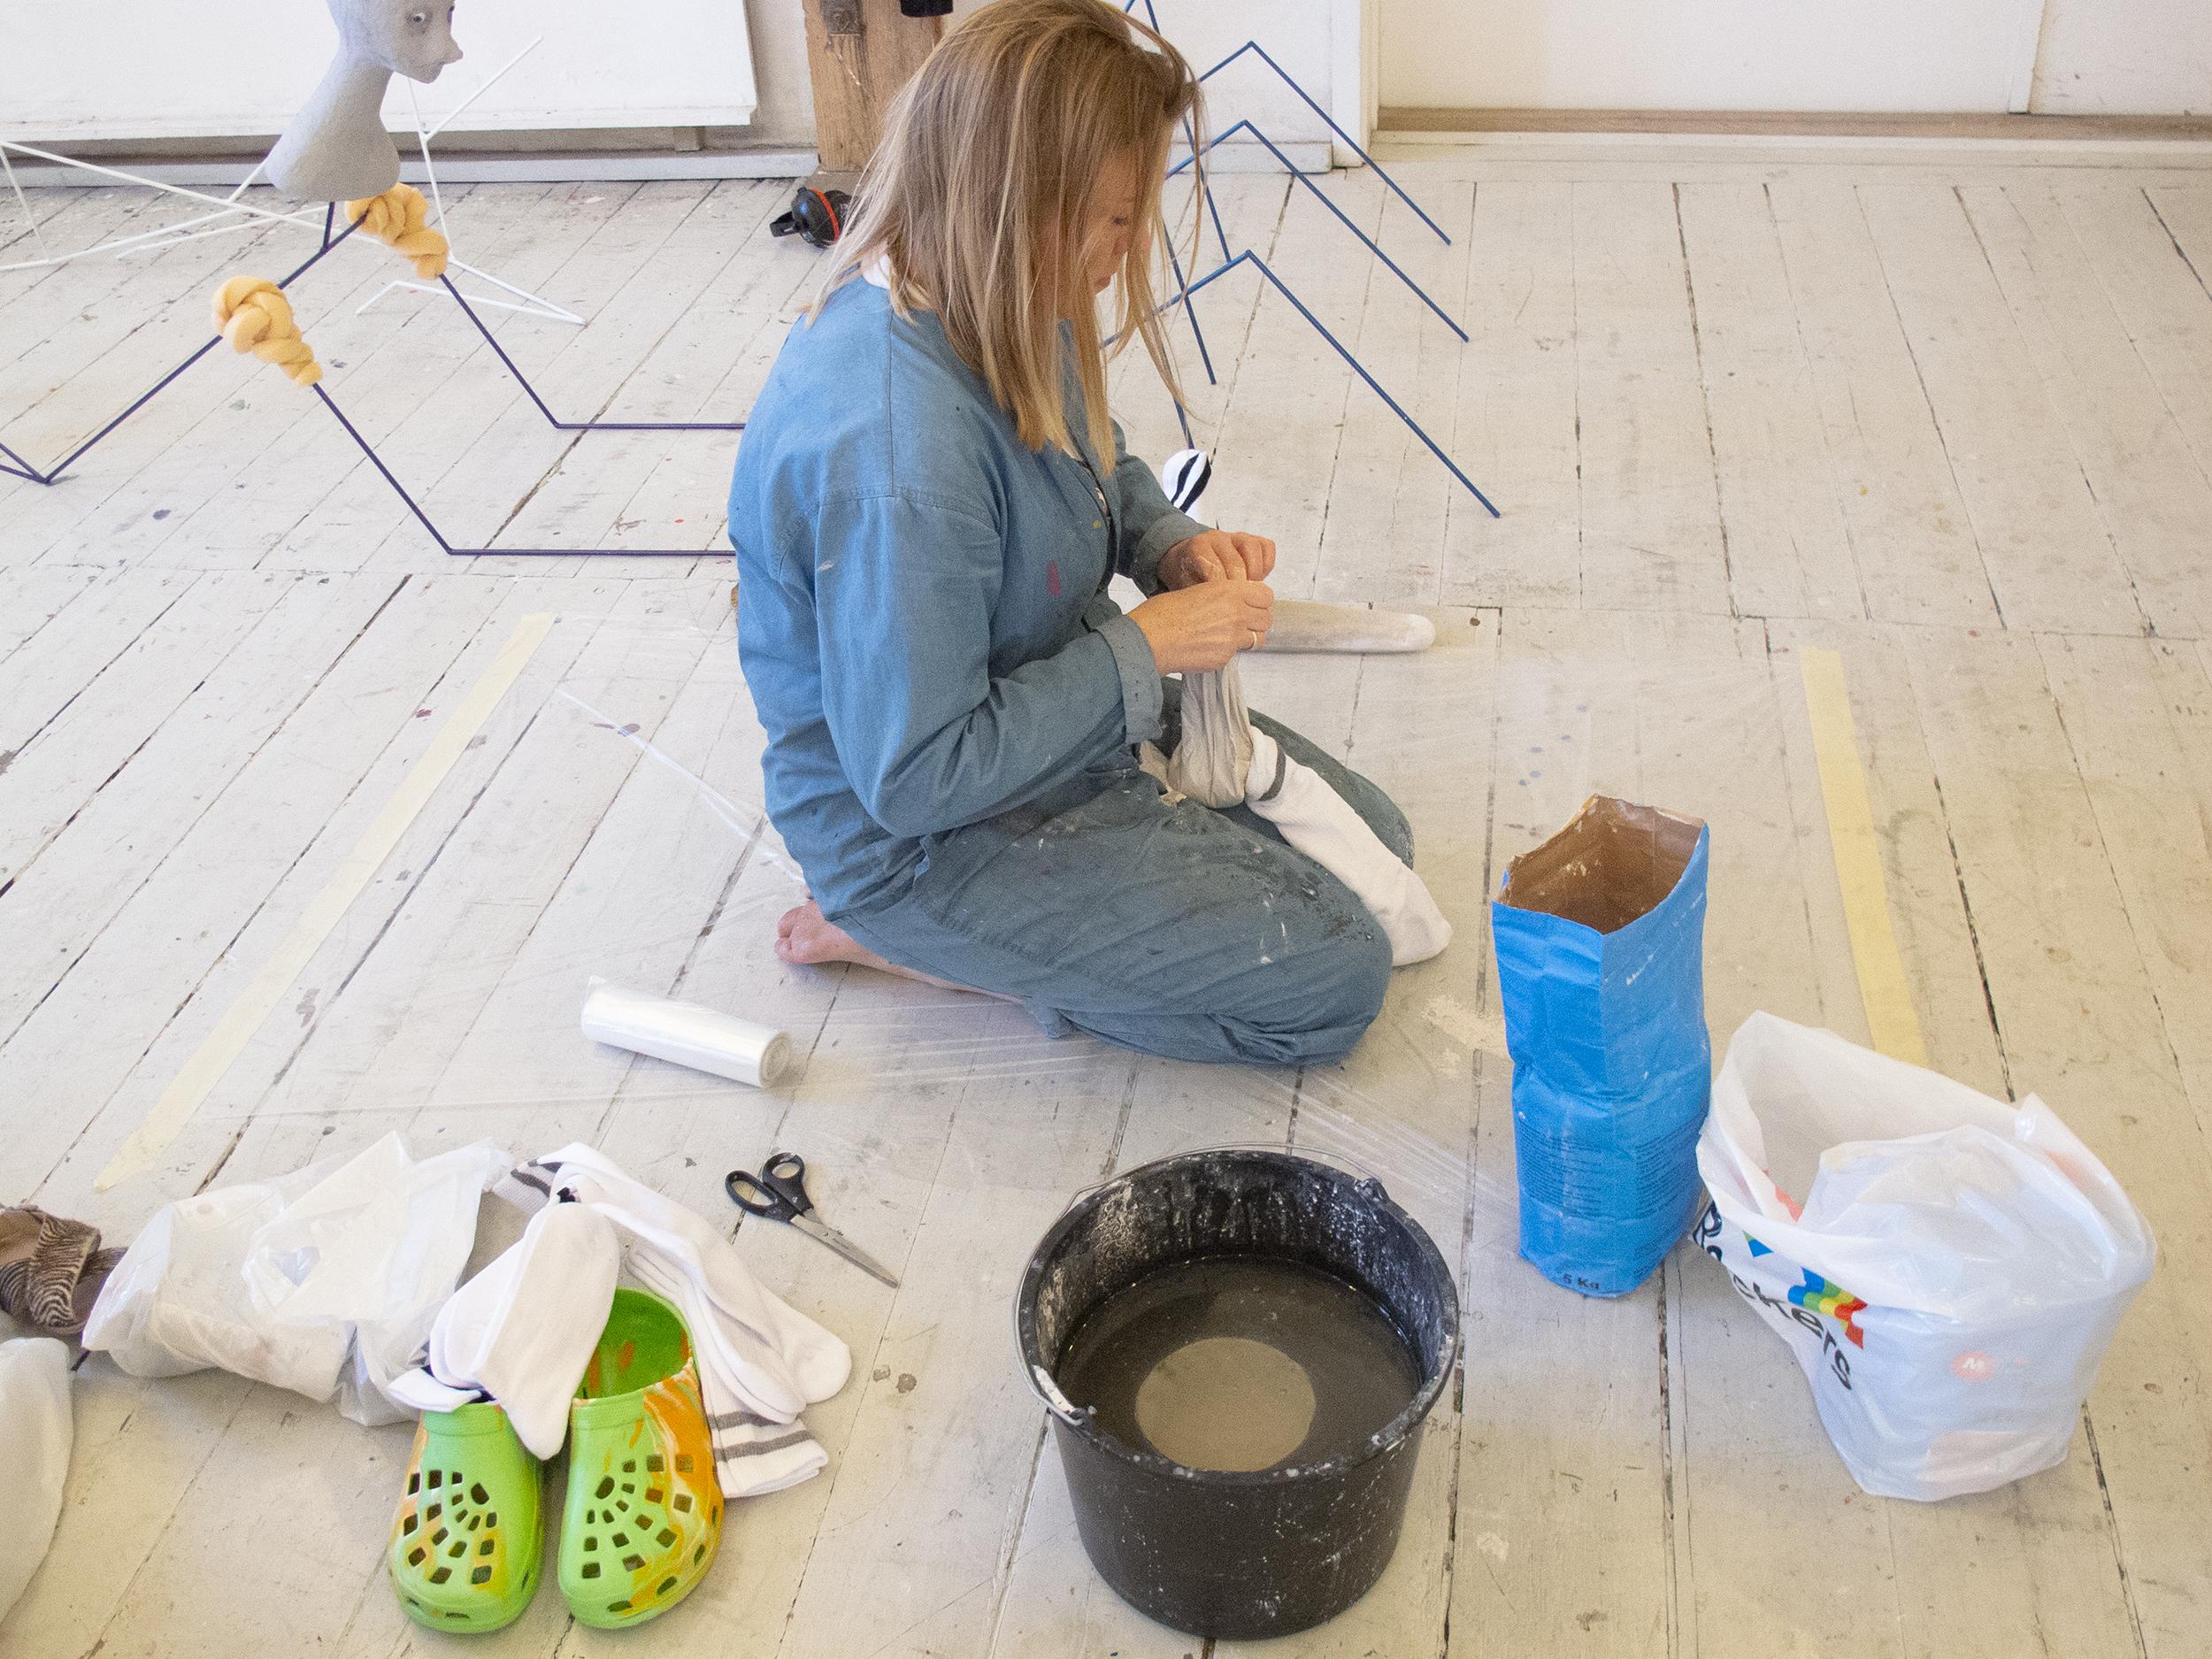 Nanna Starck støber gips i tennissokker i atelieret